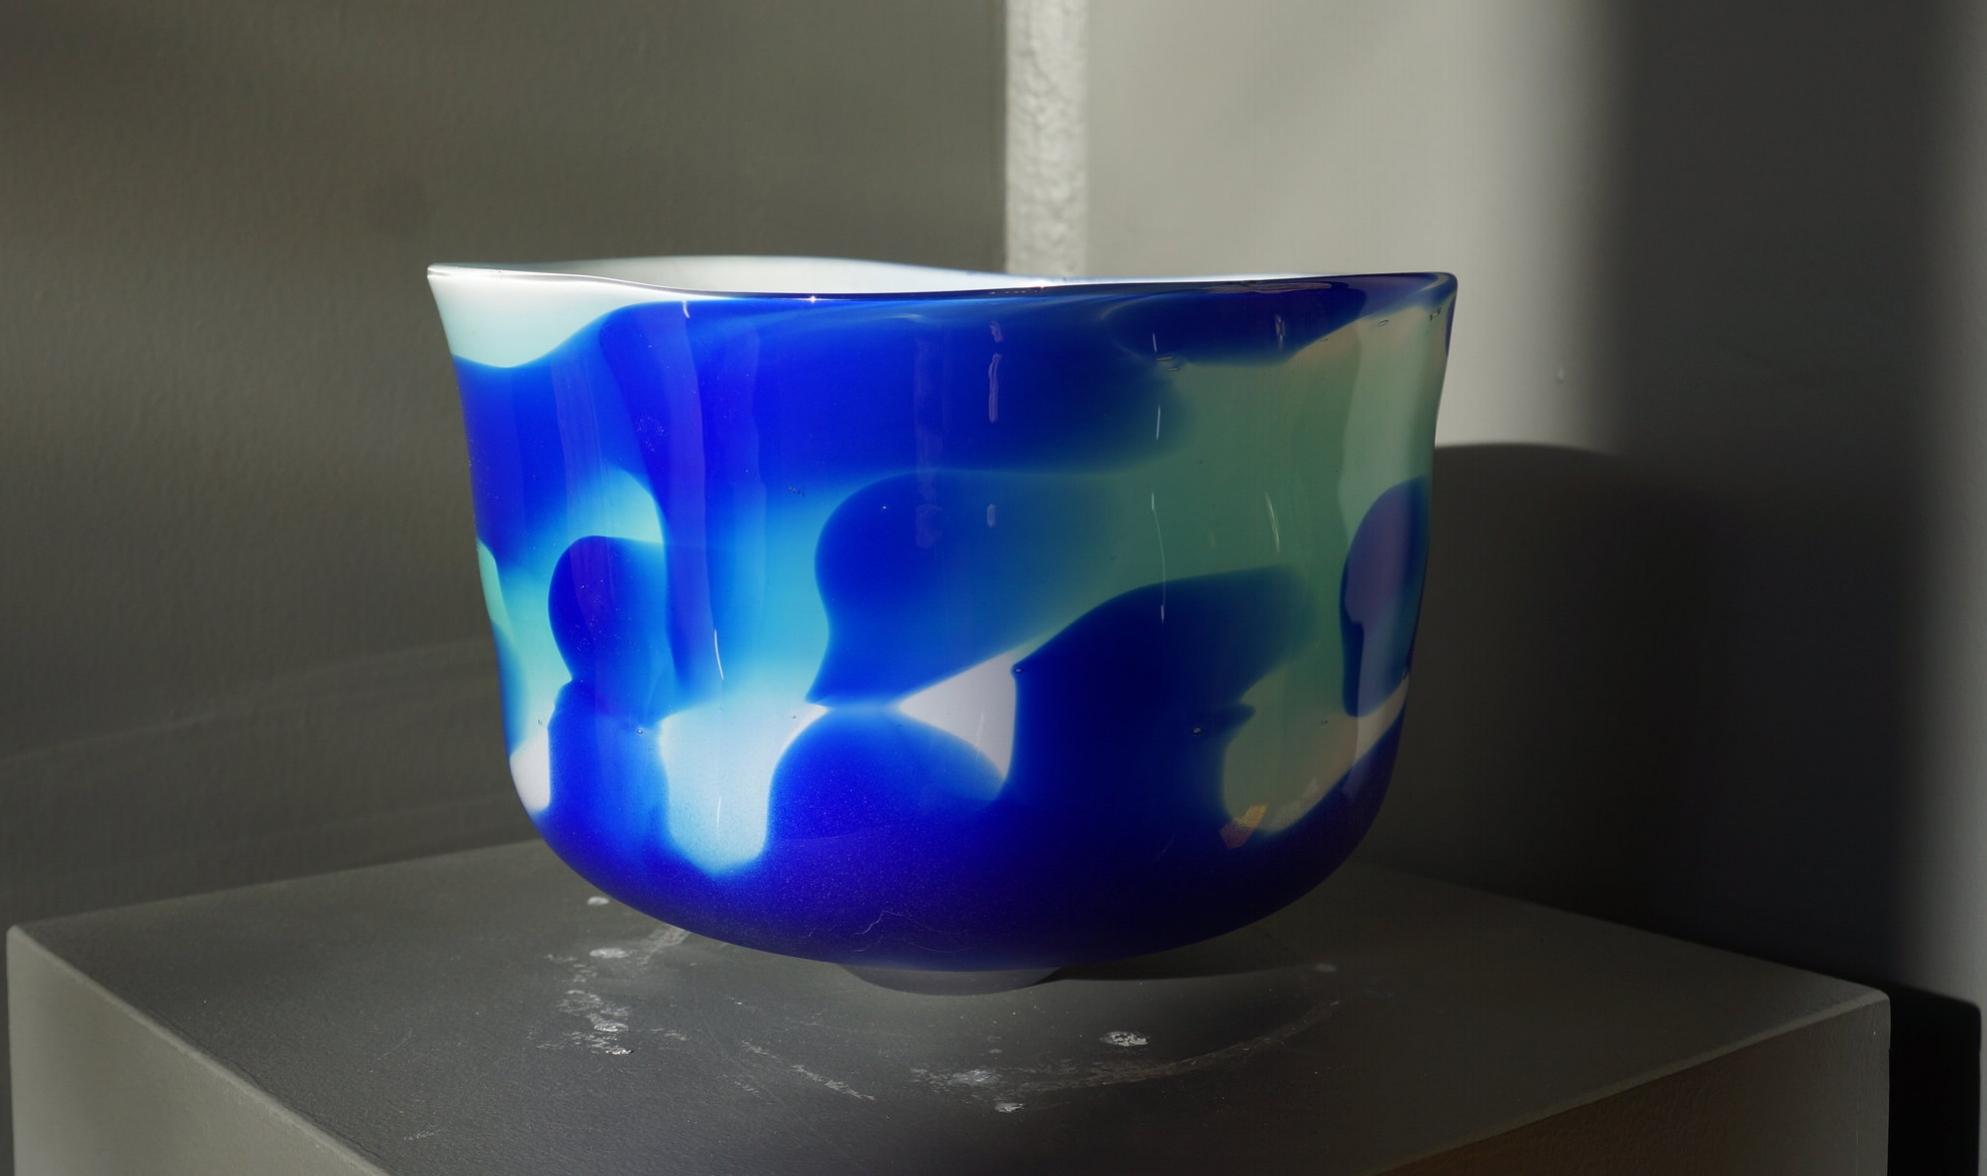 GLASS BOWL 9 IN $350.